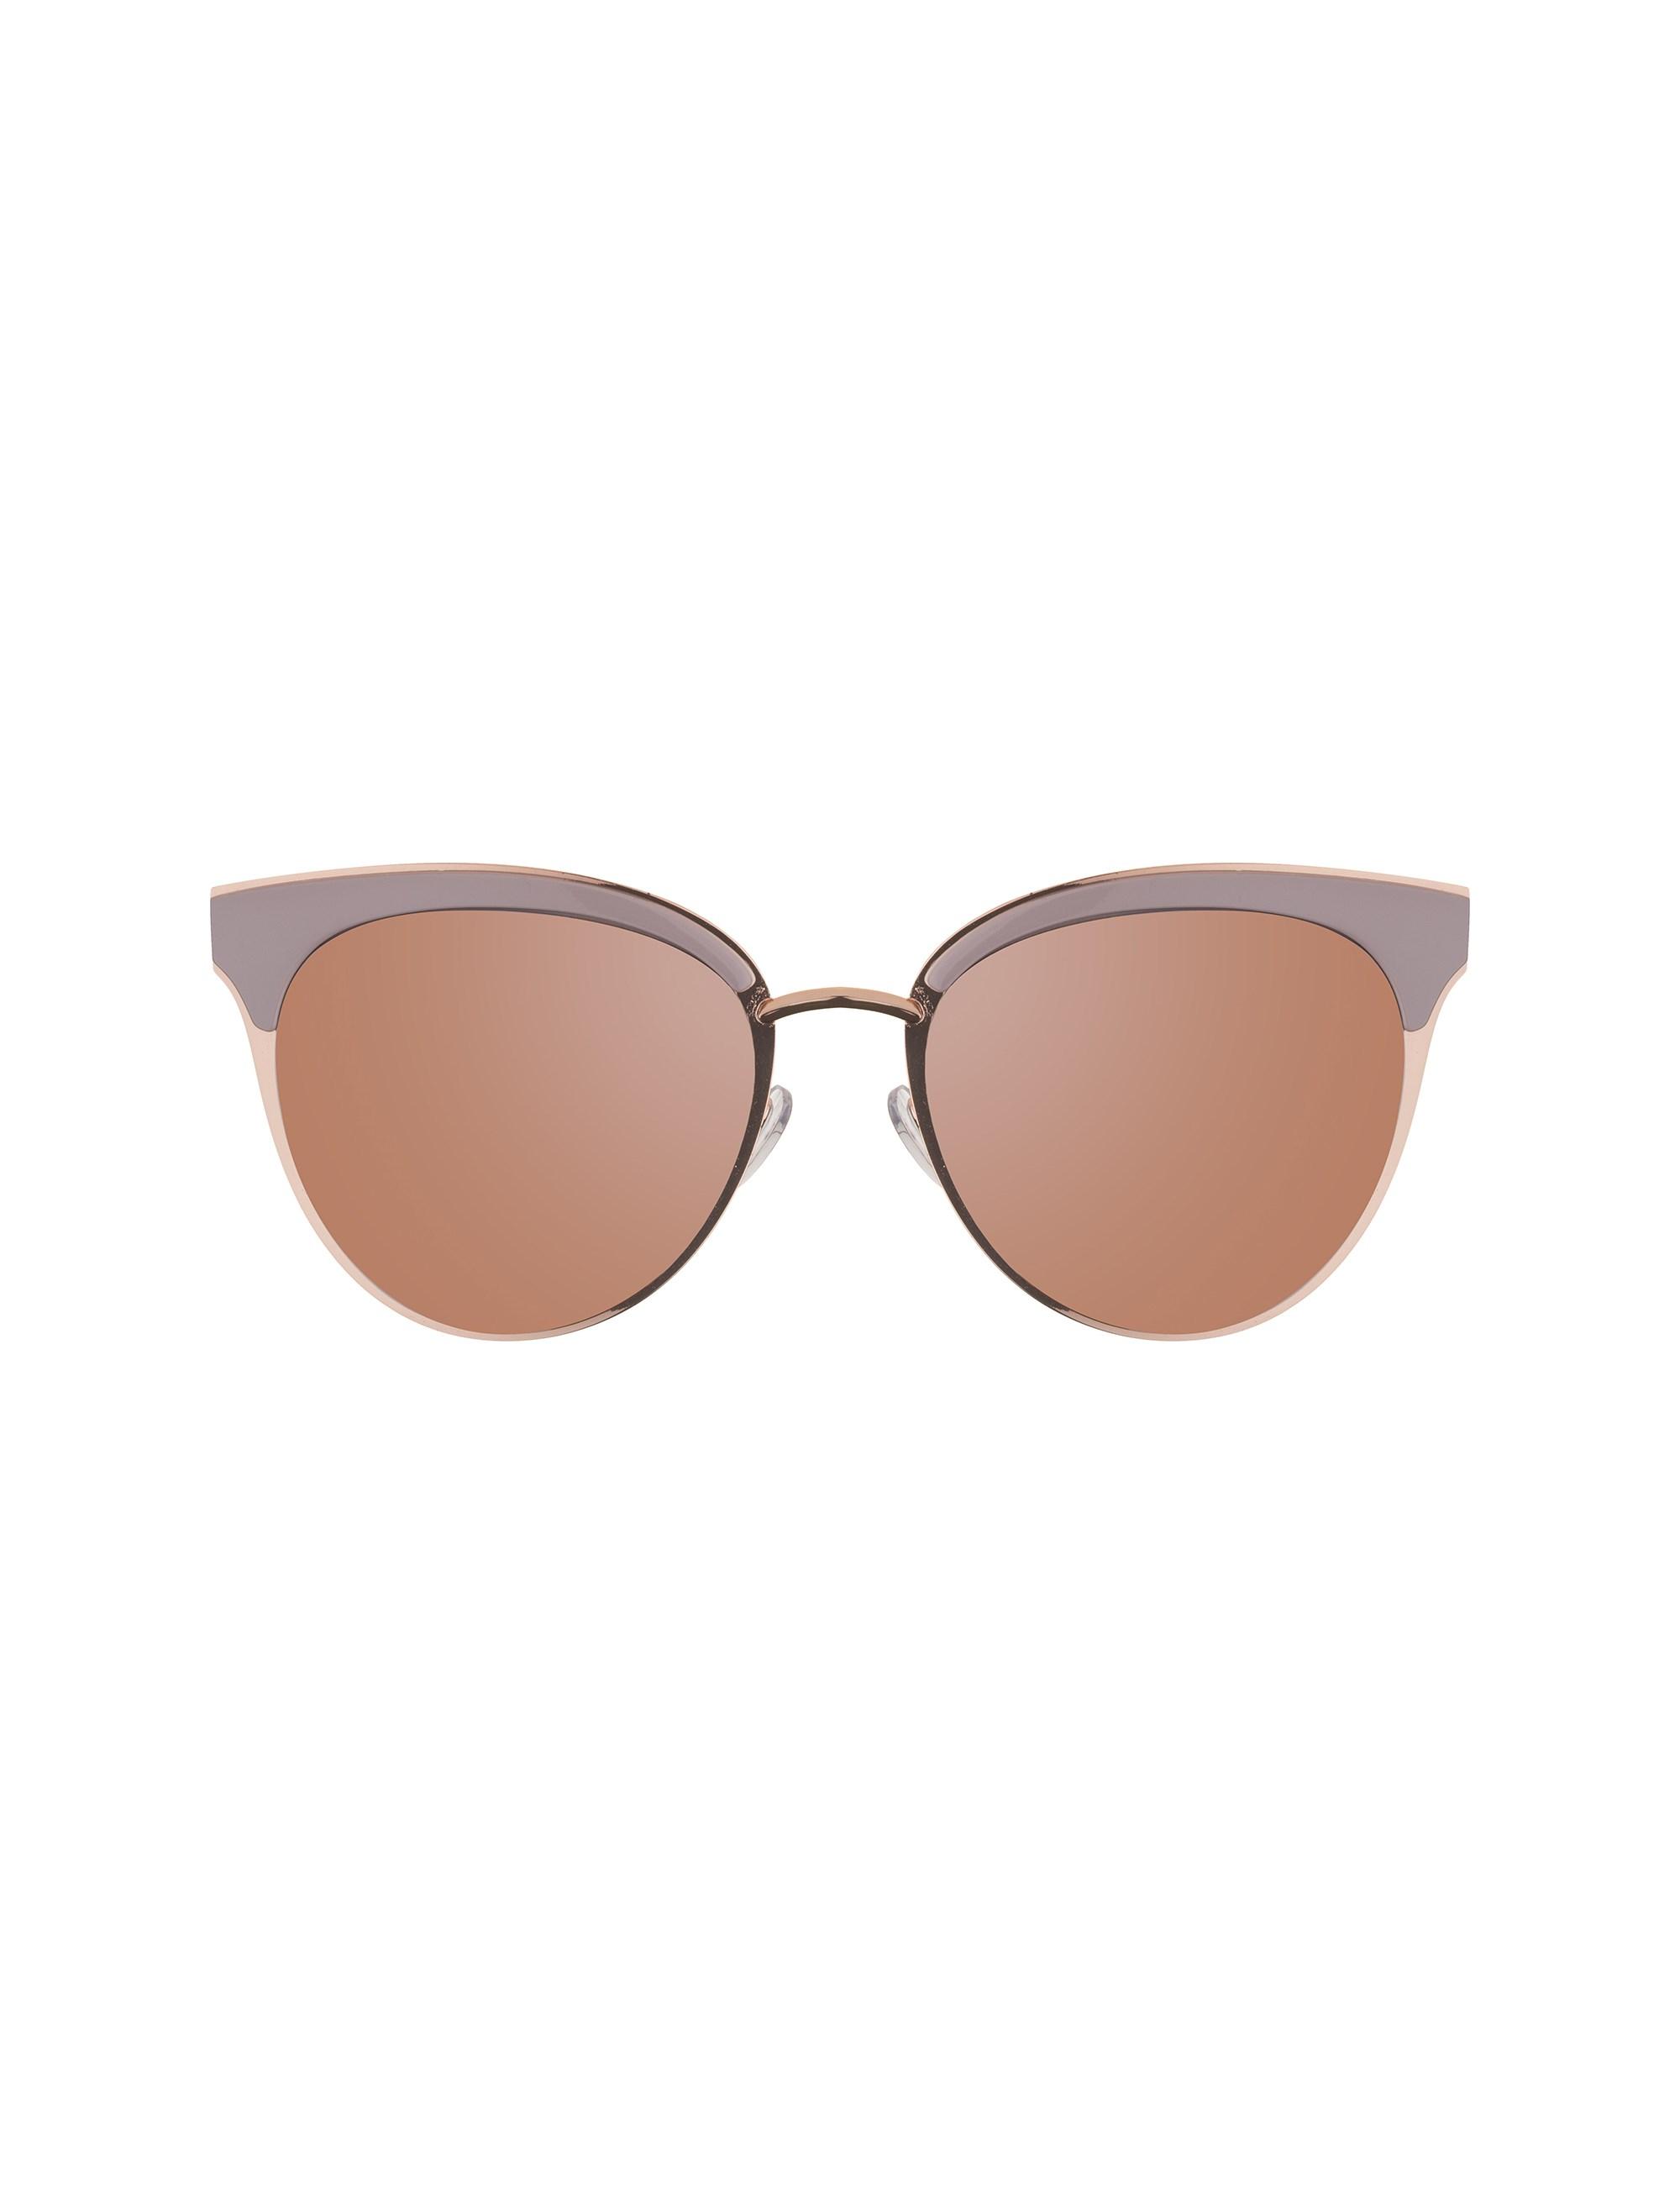 عینک آفتابی پنتوس زنانه - صورتي - 1